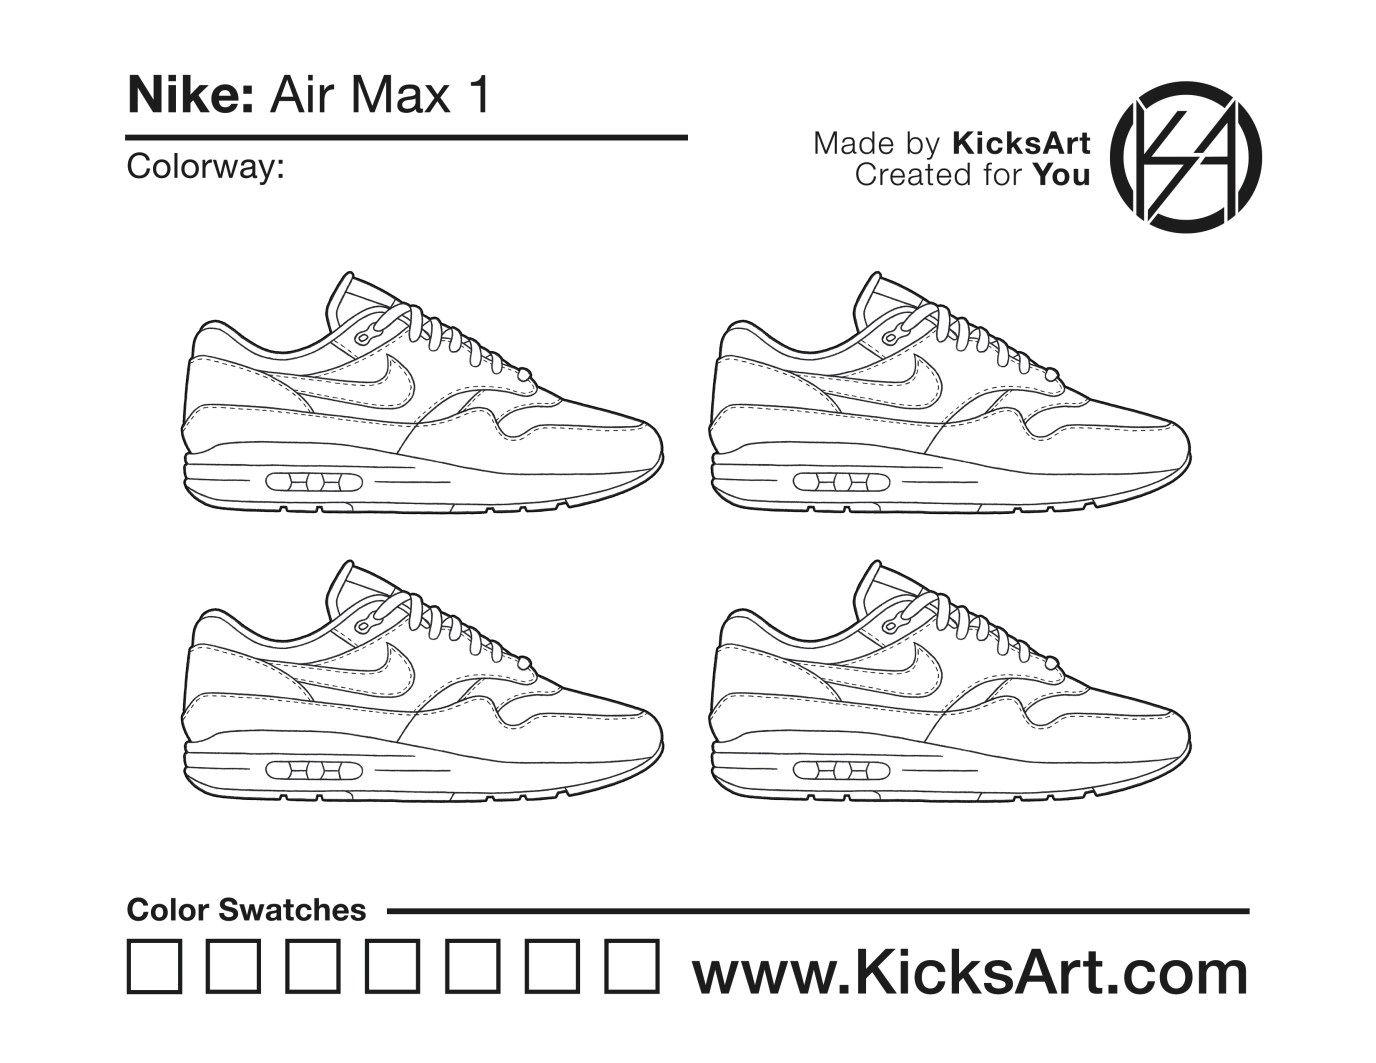 Nike Air Max 1 Kicksart Air Max Air Max 1 Nike Air Max